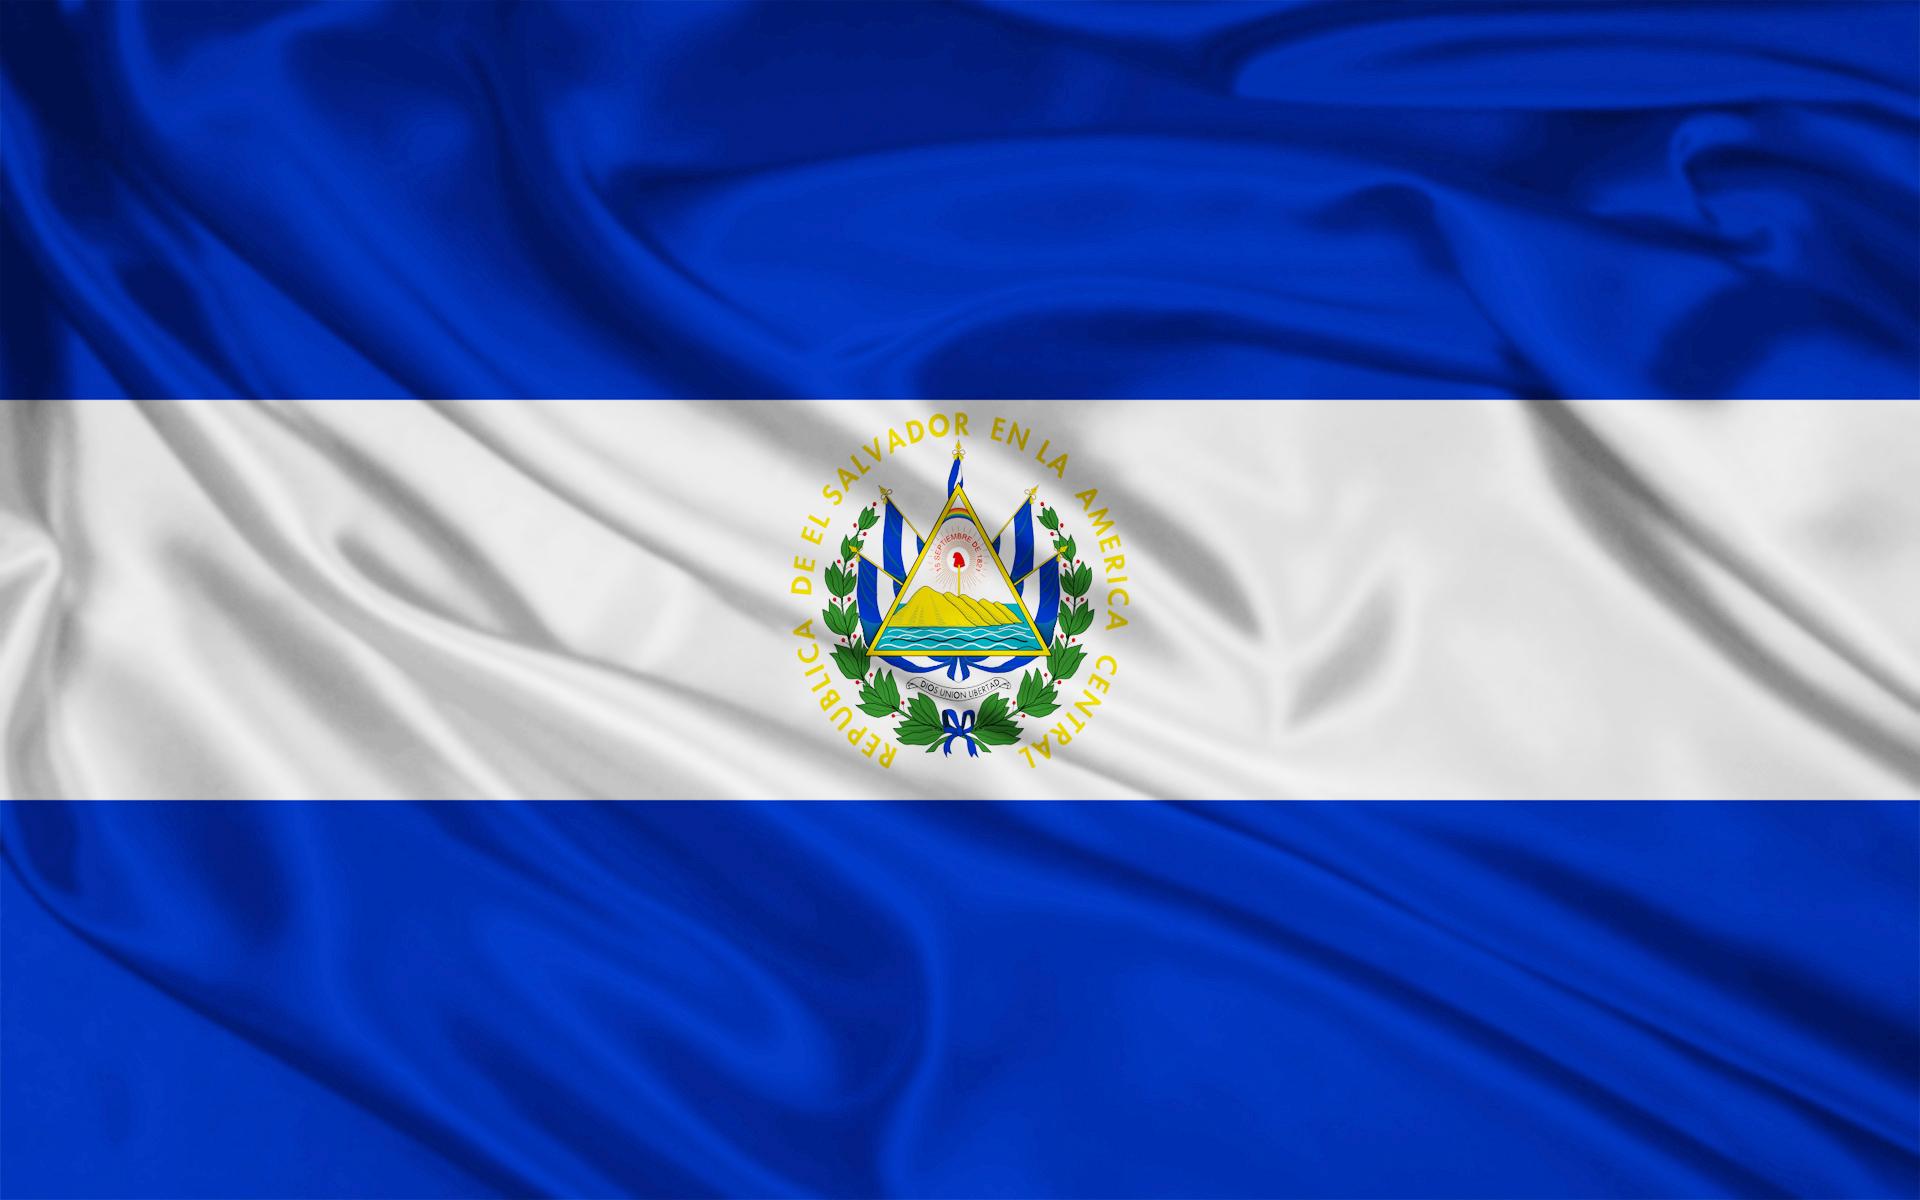 Bandera de El Salvador, Historia de la Bandera de El Salvador